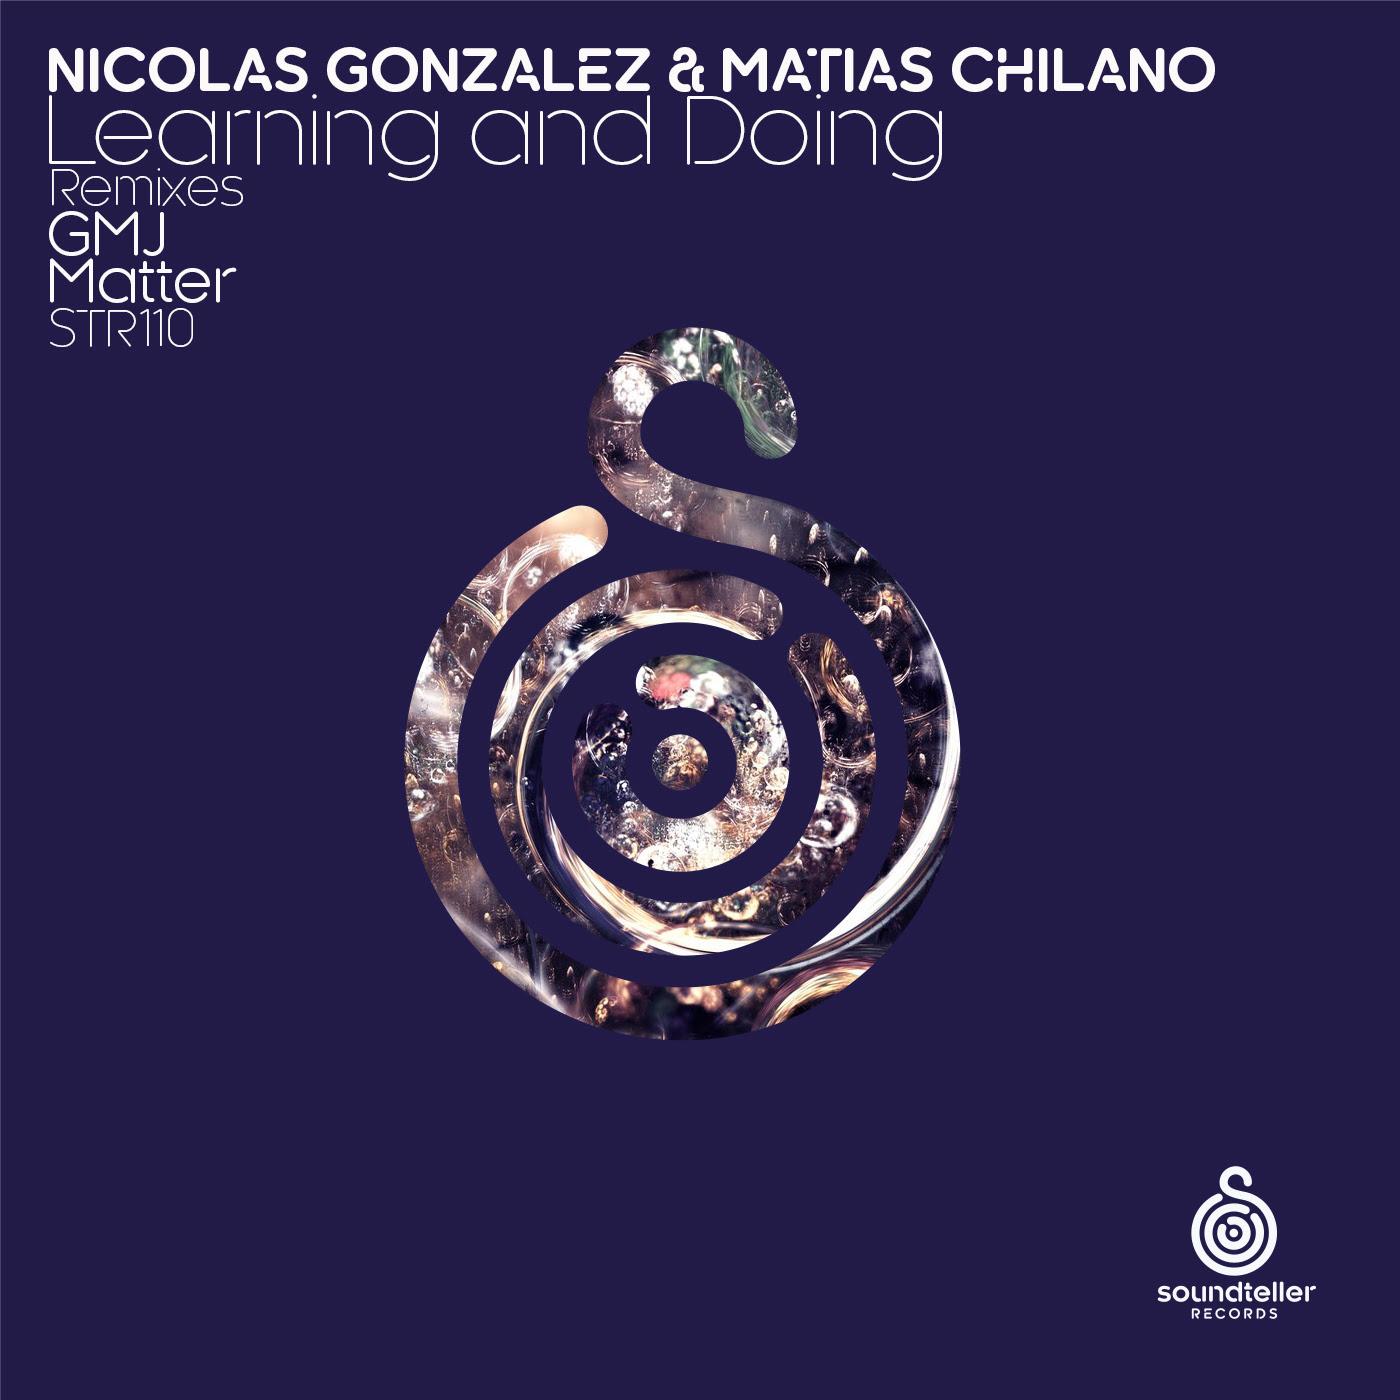 Nicolas Gonzalez & Matias Chilano - Learning and Doing (Soundteller Records)